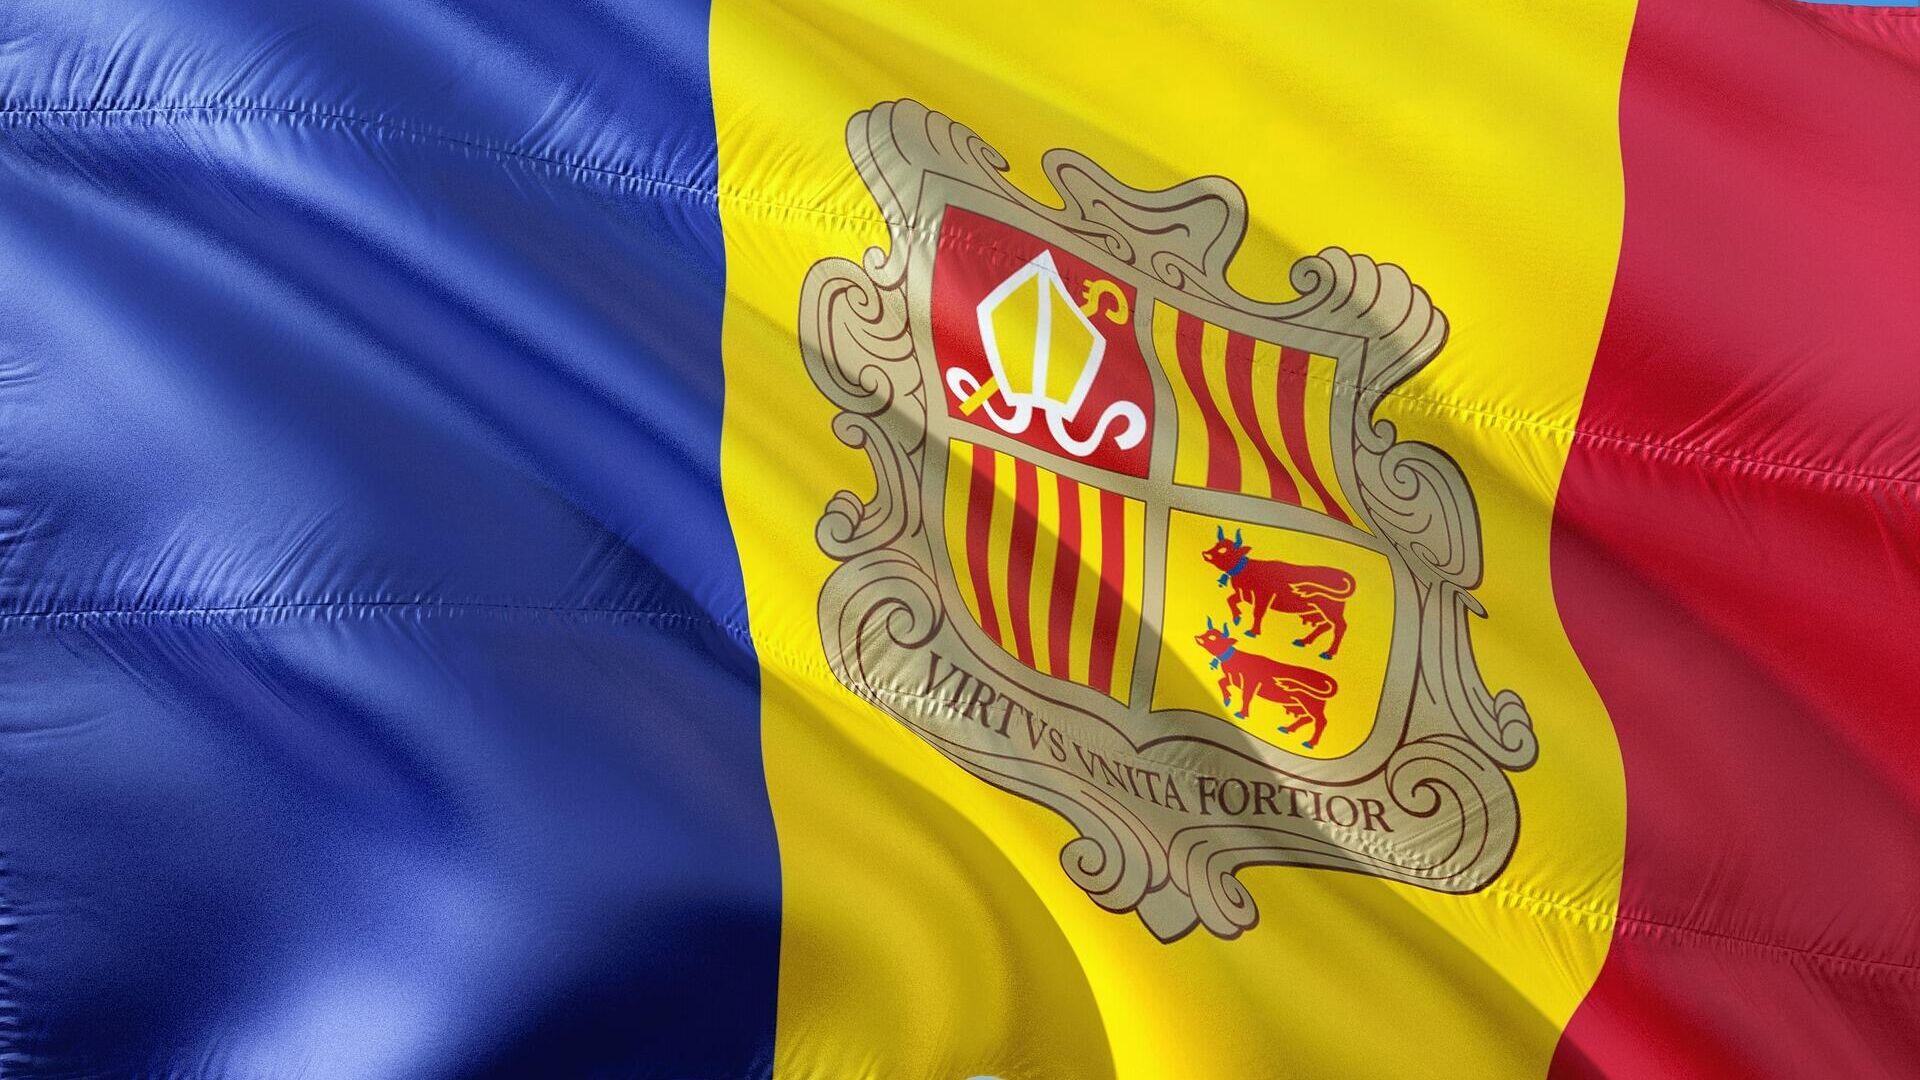 La bandera de Andorra - Sputnik Mundo, 1920, 12.02.2021